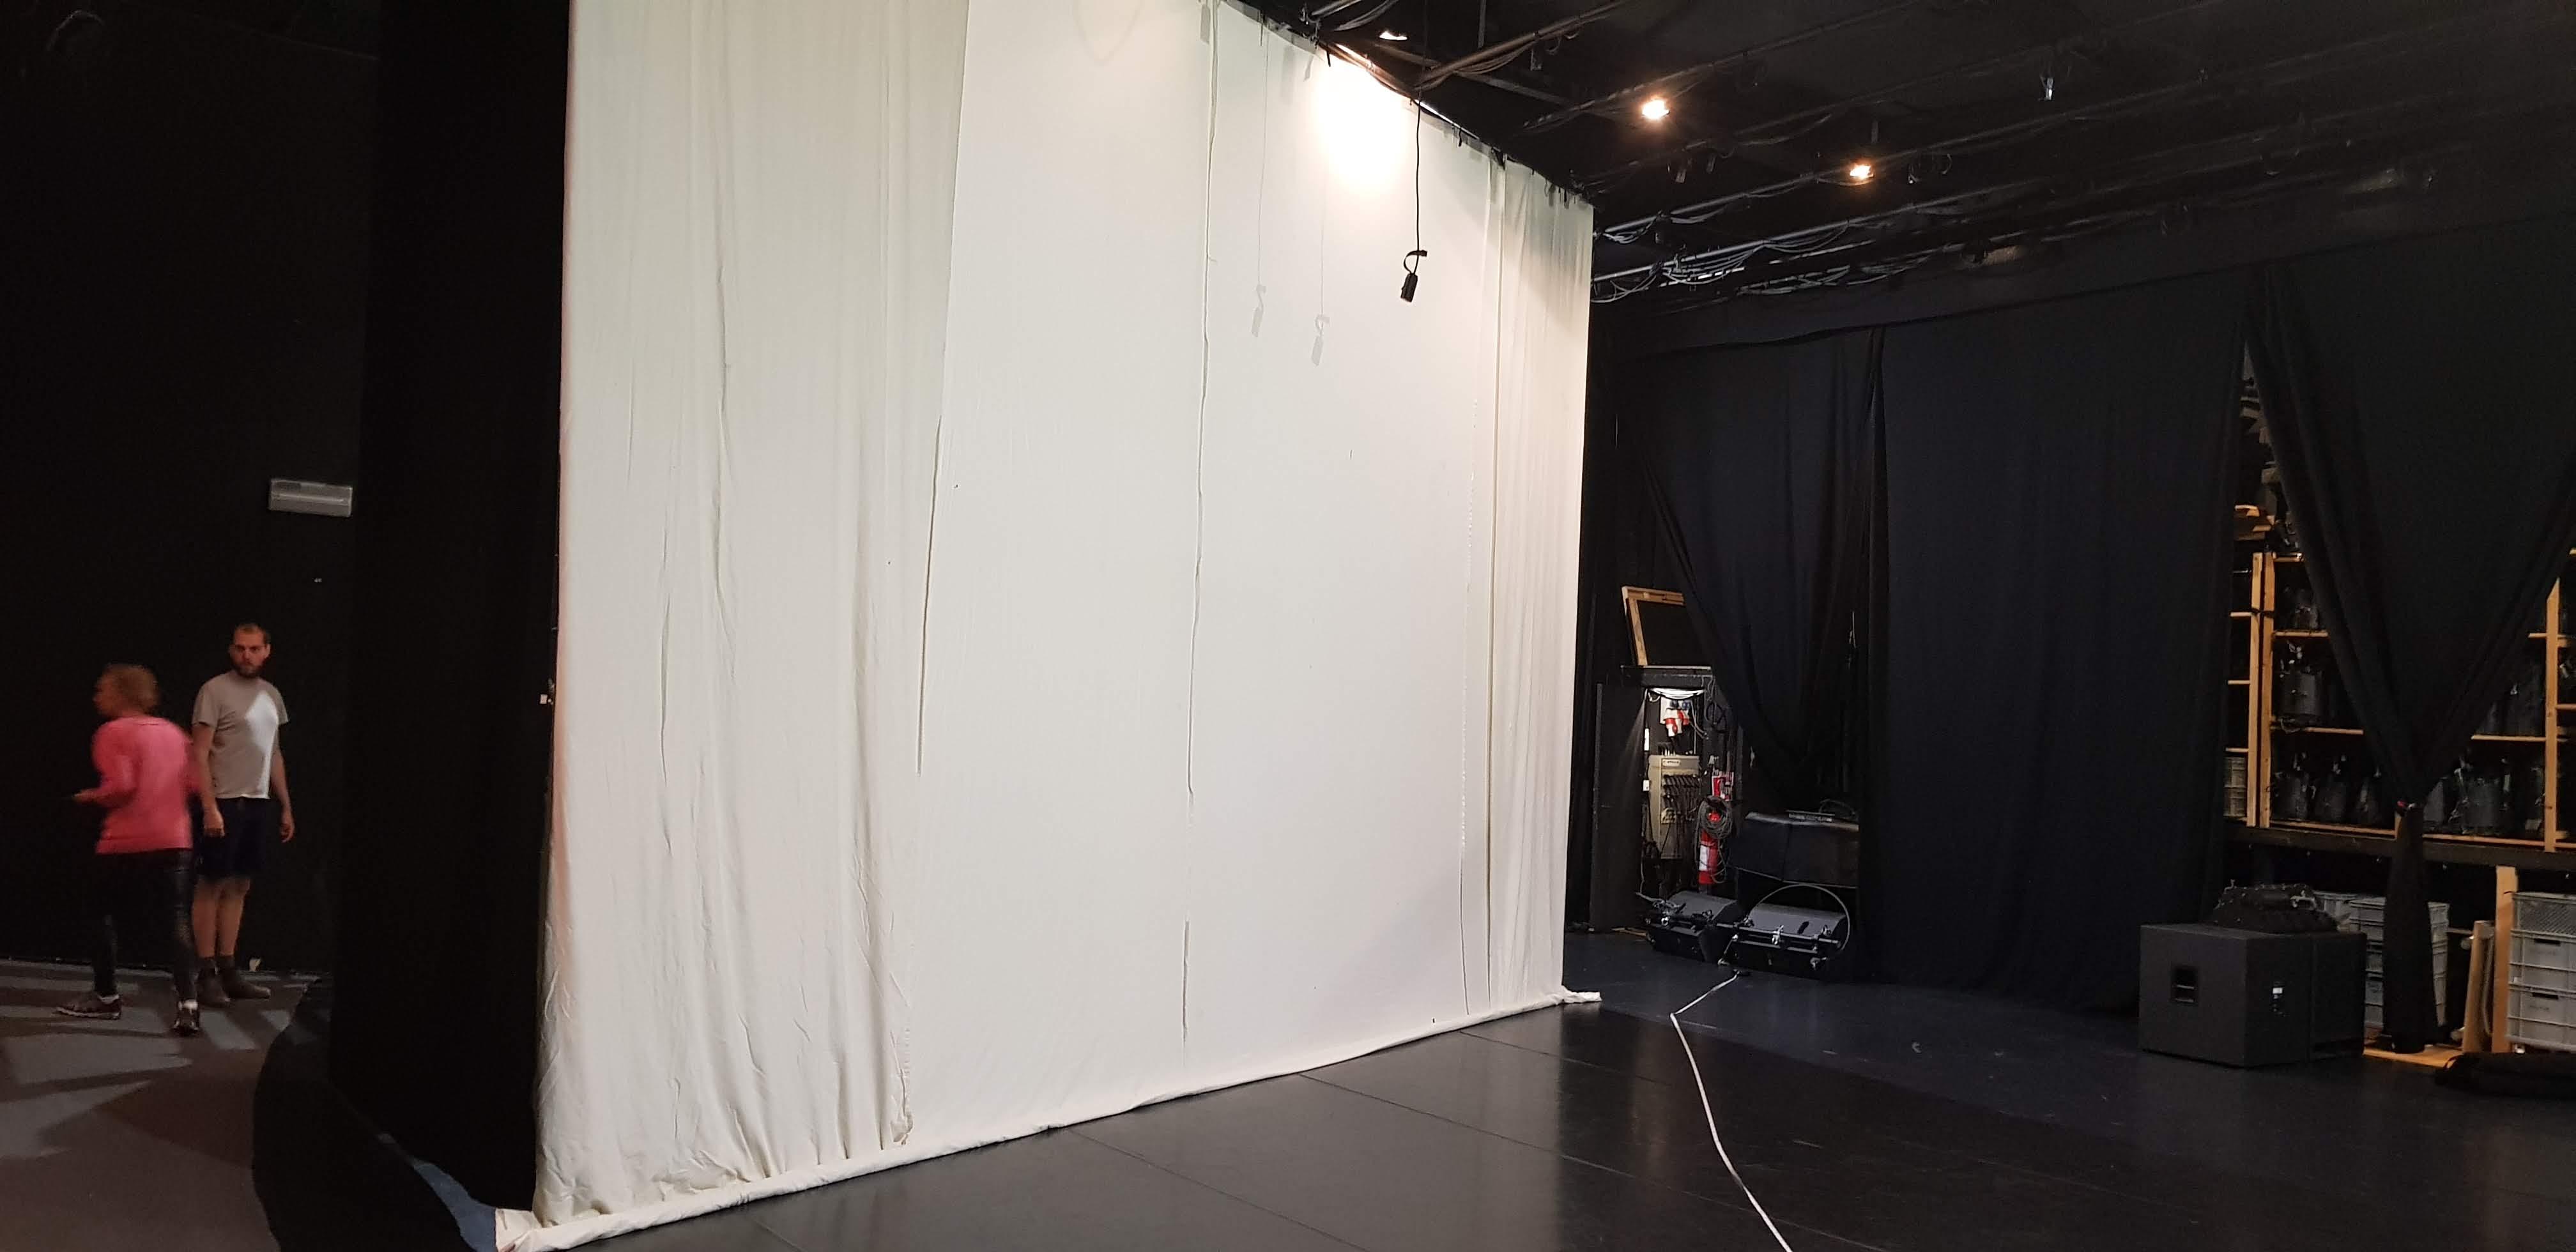 Arbetet på scenen